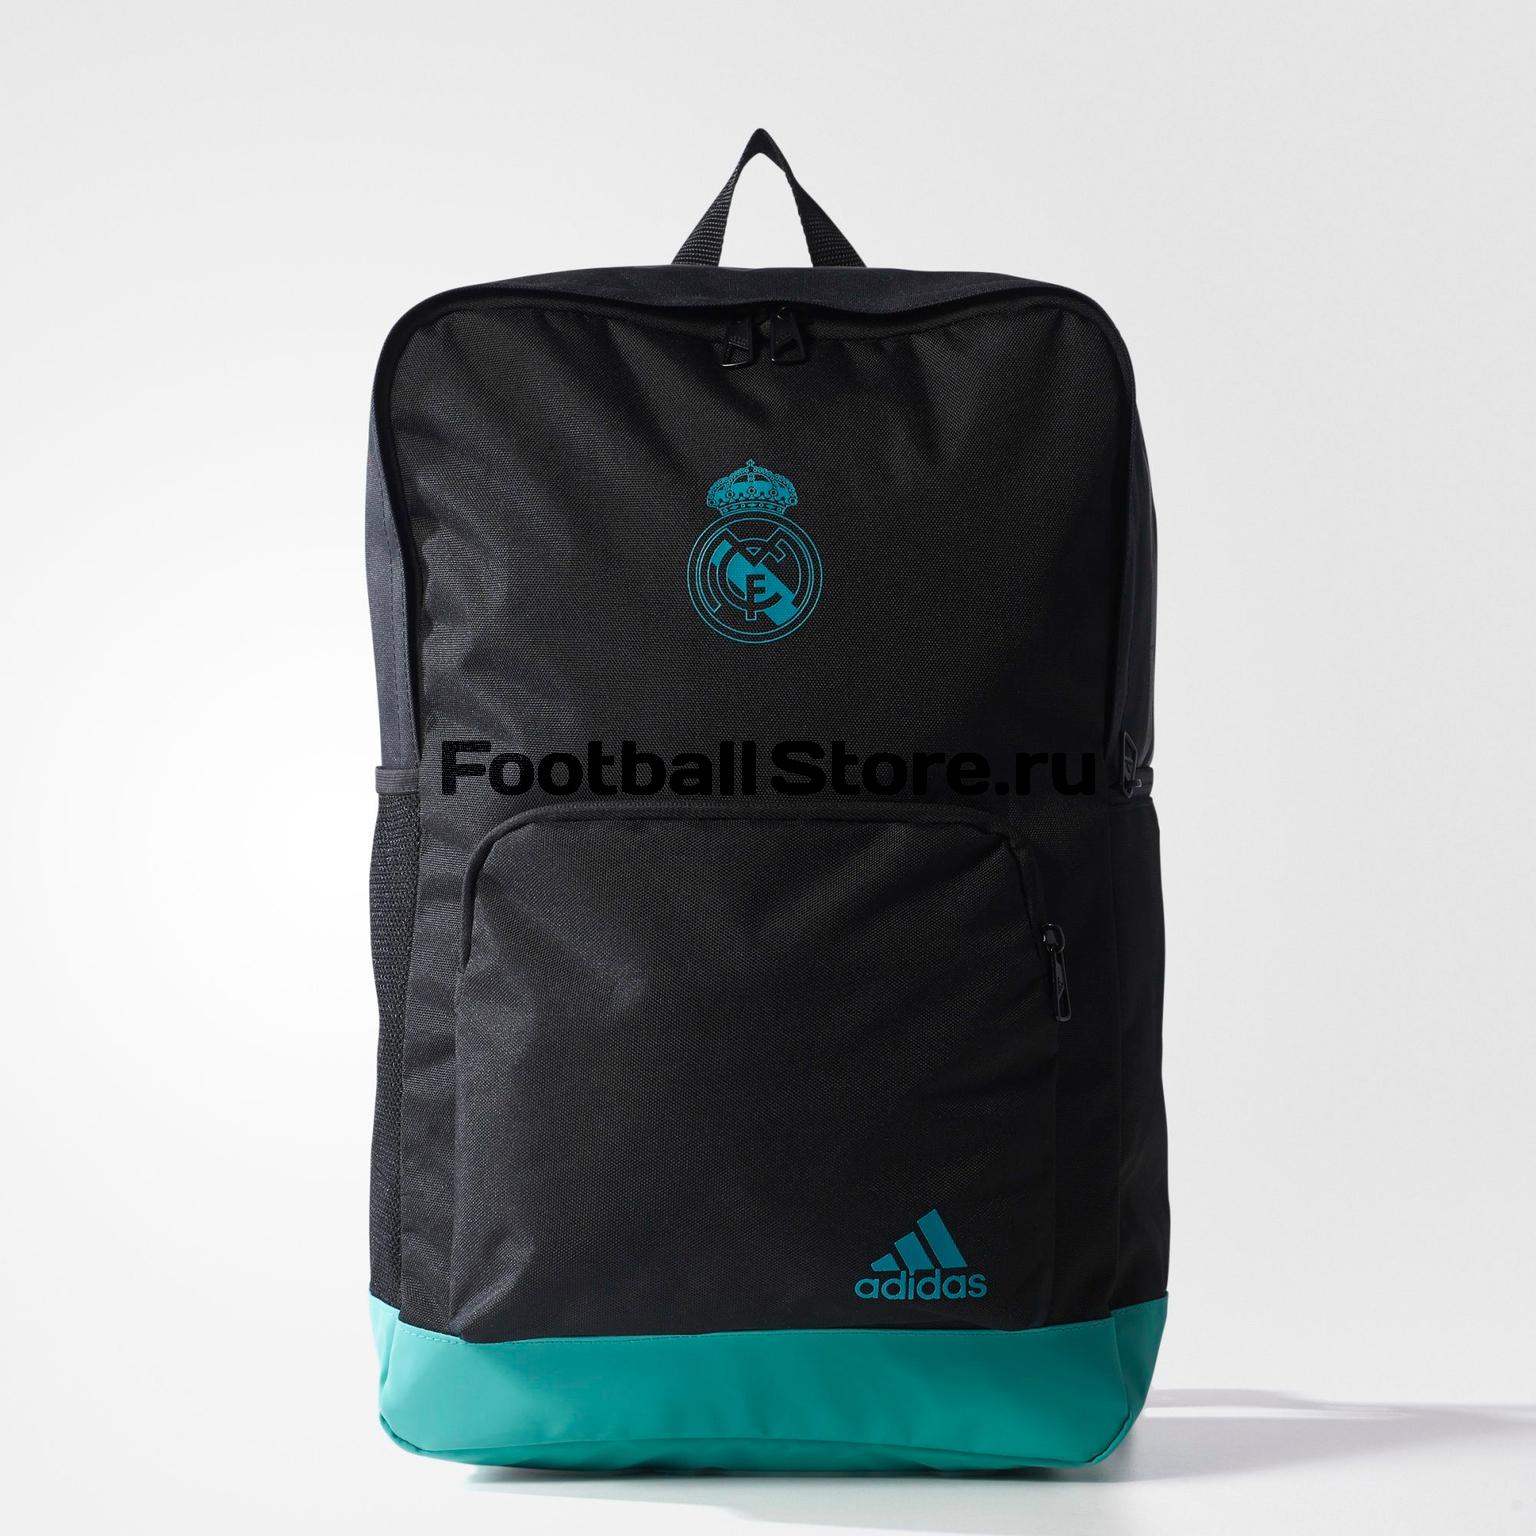 587c9b37 Рюкзак Adidas Real Madrid Backpack BR7151 – купить в интернет ...